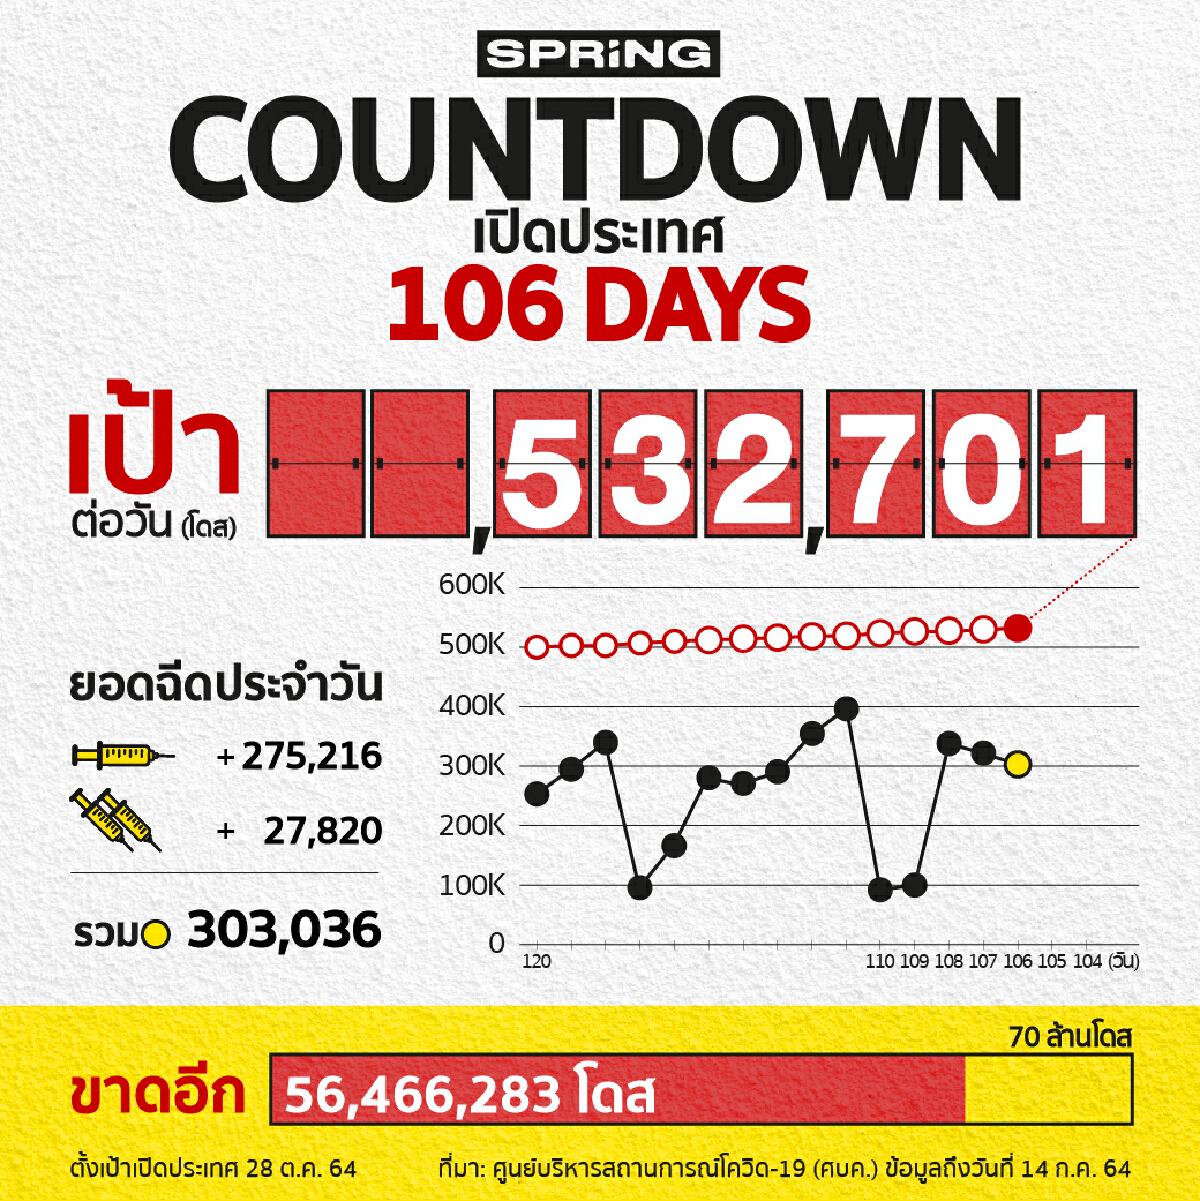 COUNTDOWN! เปิดประเทศใน 106 วัน ฉีดวัคซีนได้ 338,980 โดส